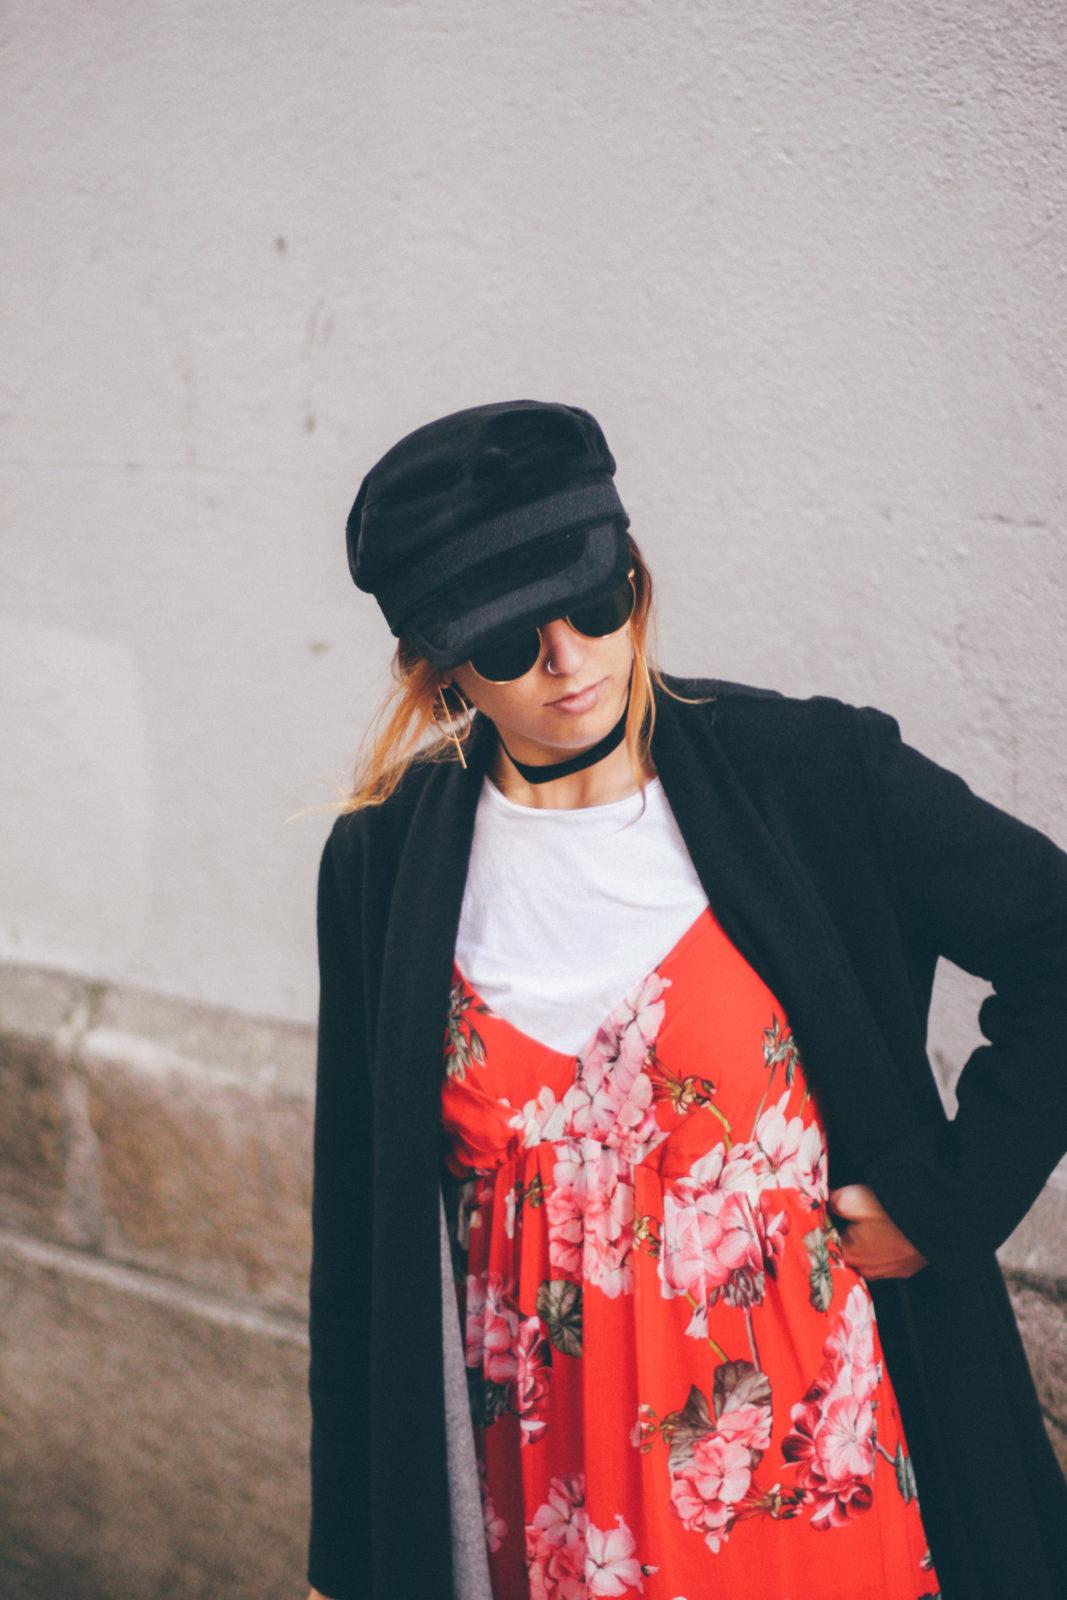 baker_boy_hat_vestido_con_camiseta_gorra_marinera_botines_hebillas_fall_2016_trends_street_style_outfits_donkeycool-15